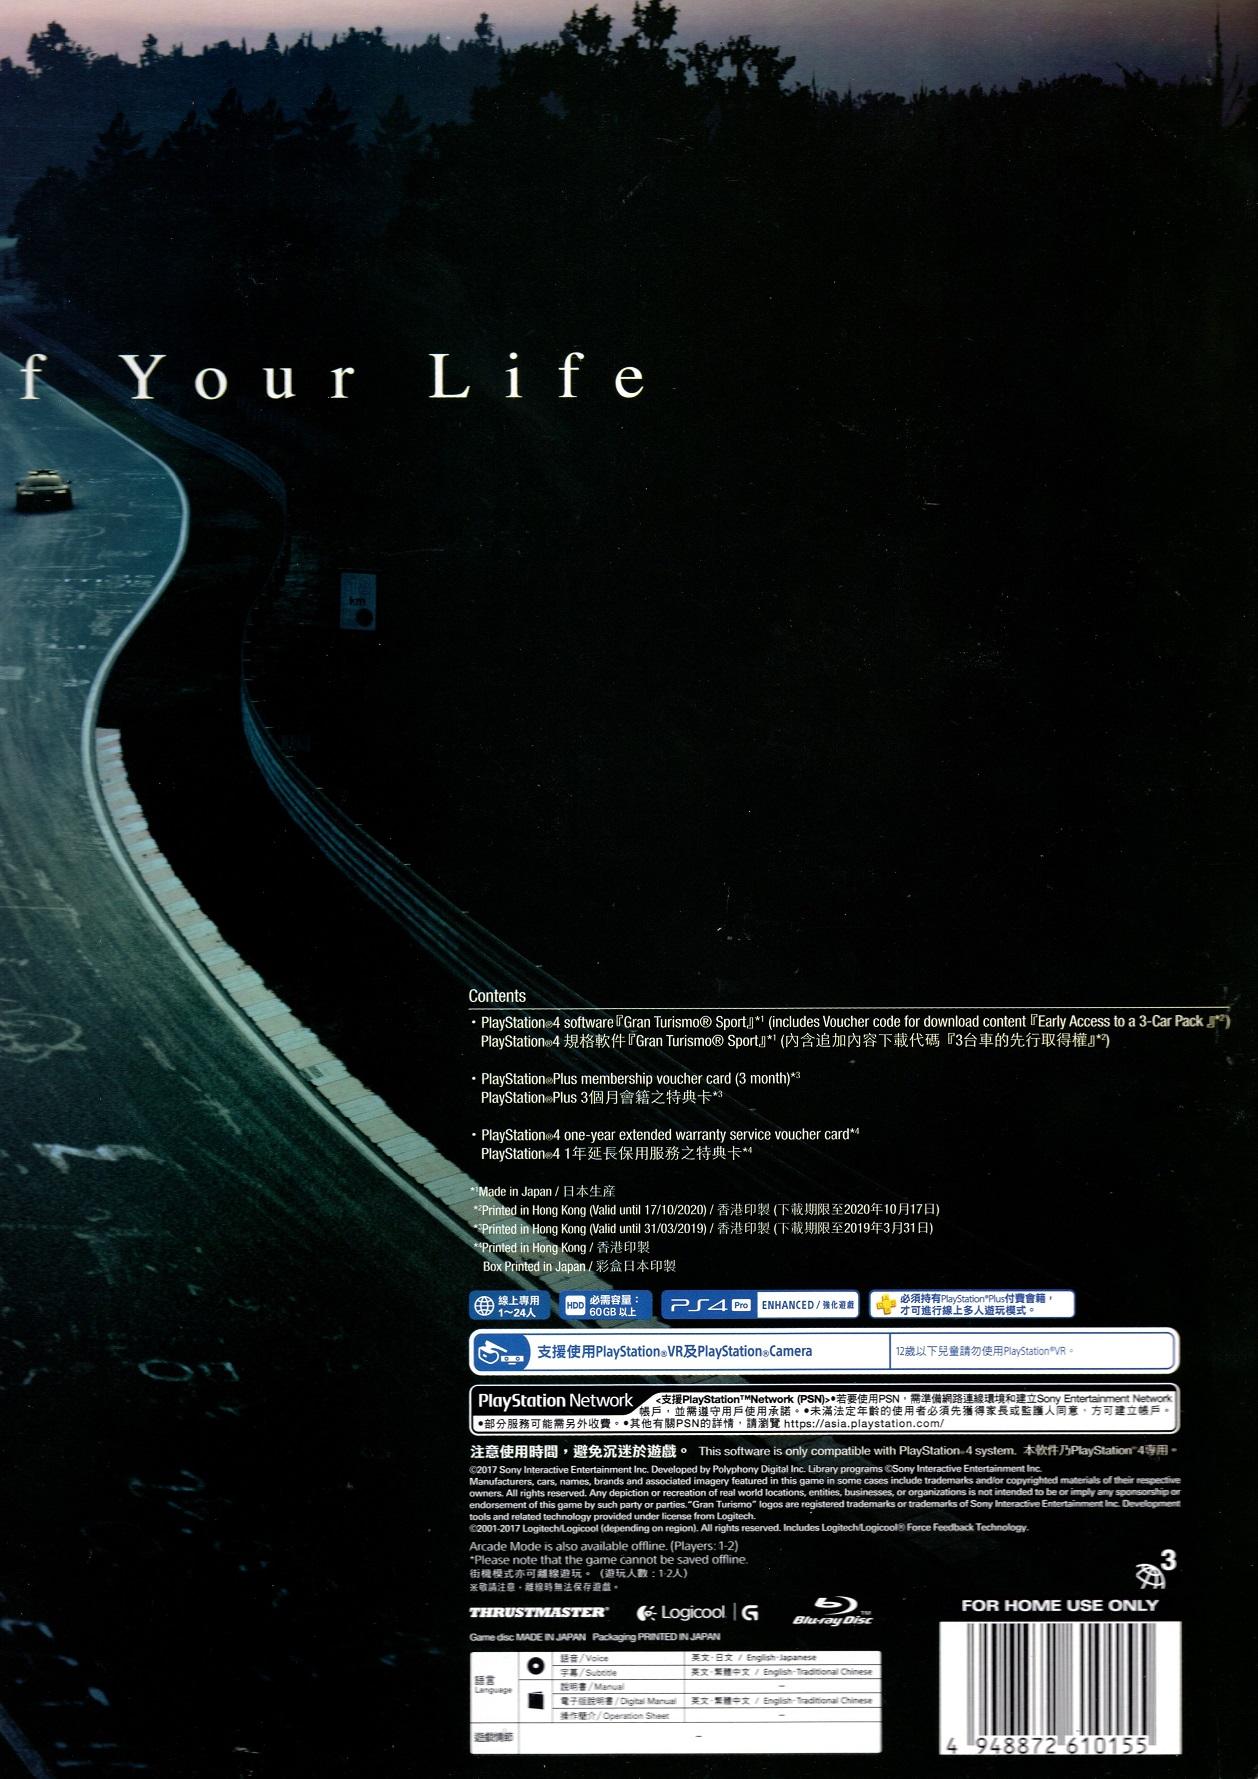 LCBMART - The greatest video game wholesaler, distributor, supplier